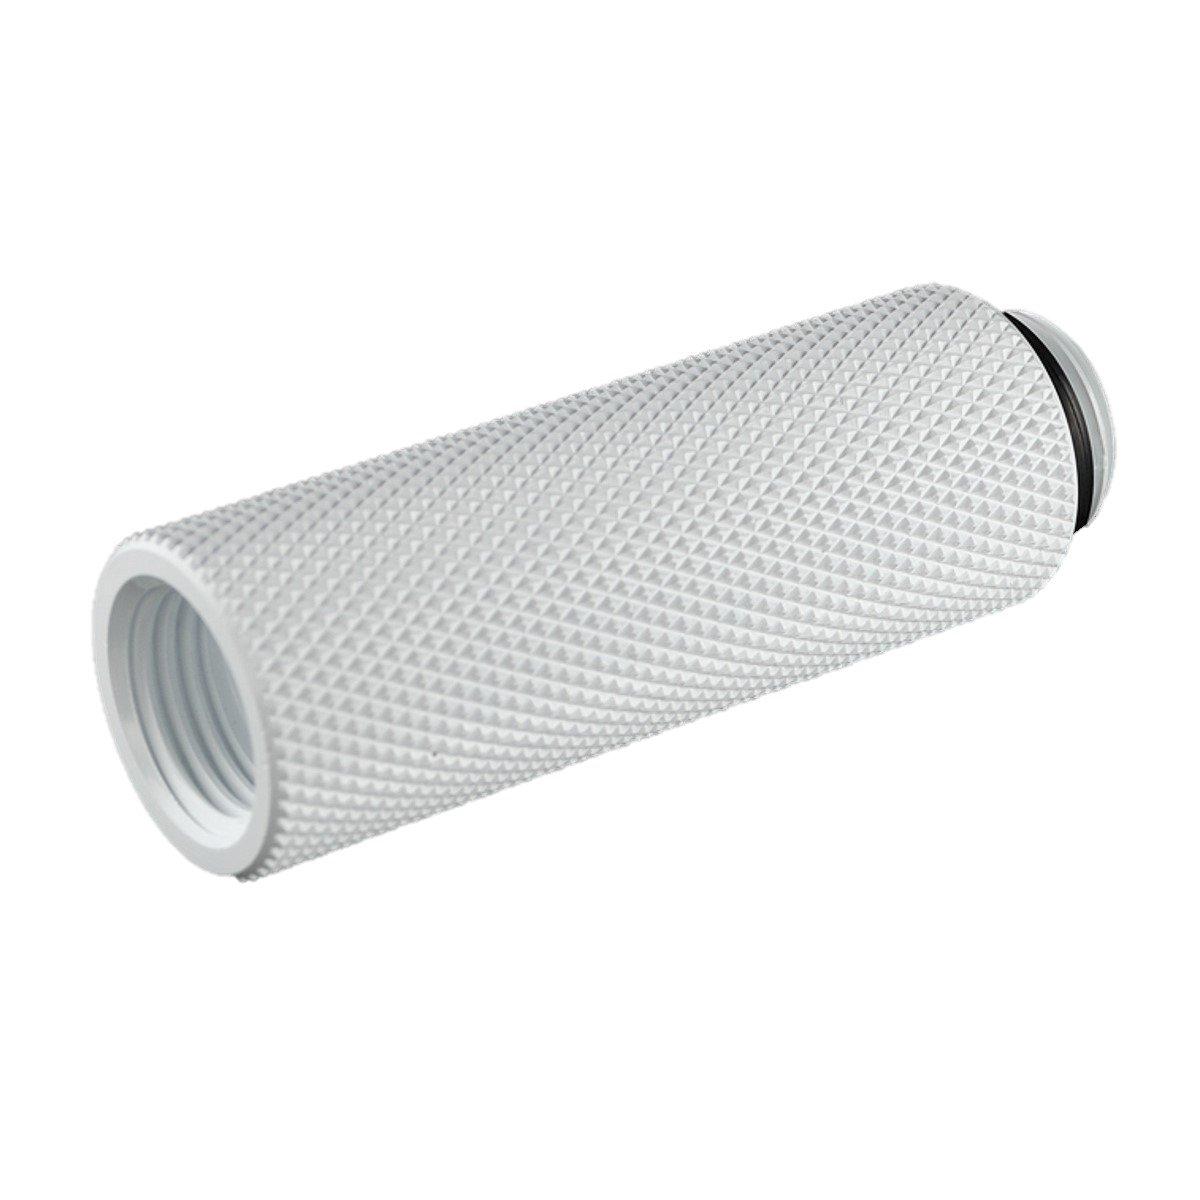 Bits Power IG 1/4 inch extender 50 mm Deluxe White (BP-DWWP-C65)